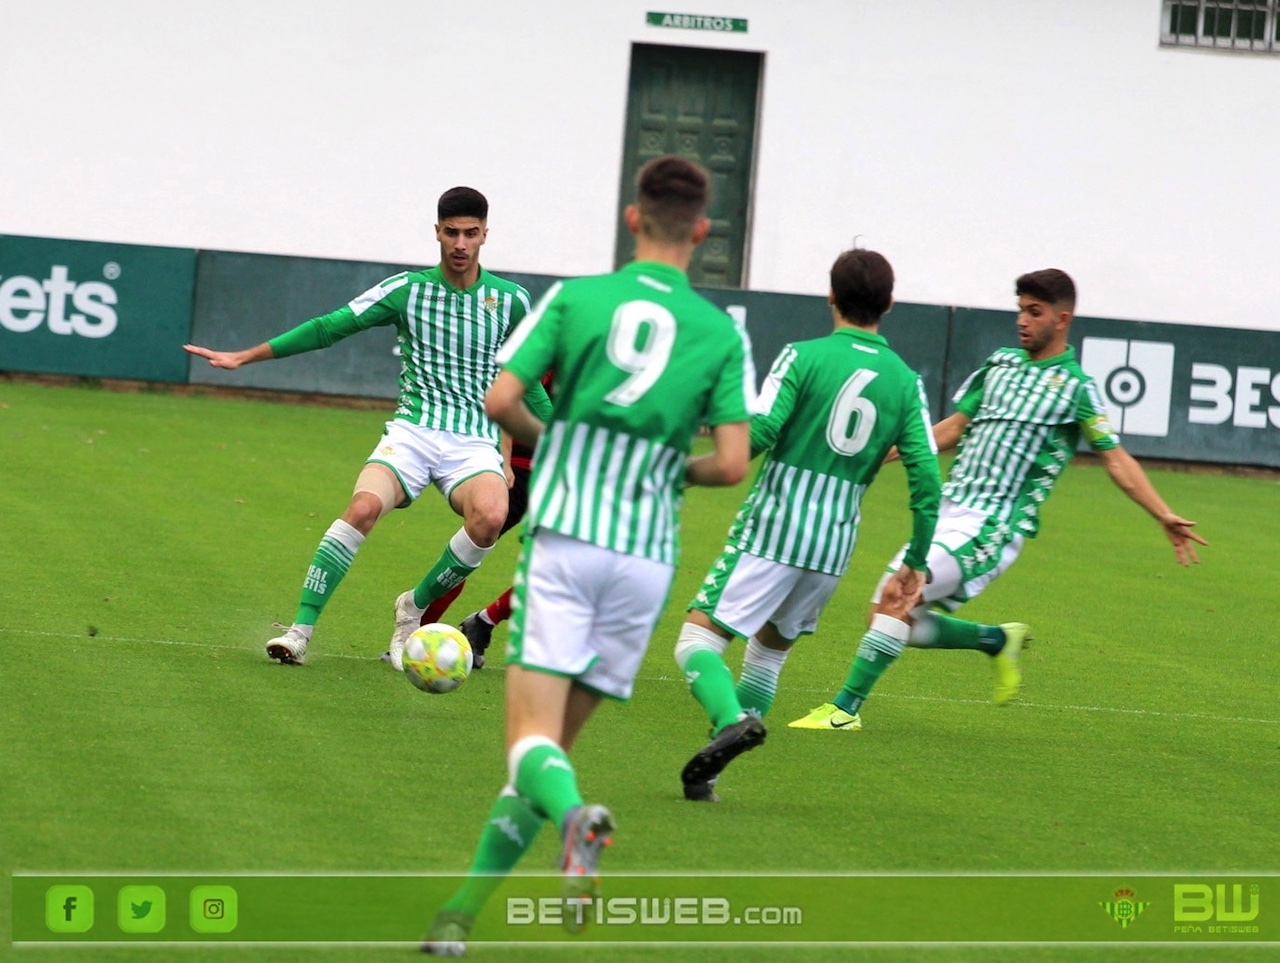 J18 - Betis Deportivo - Gerena 39